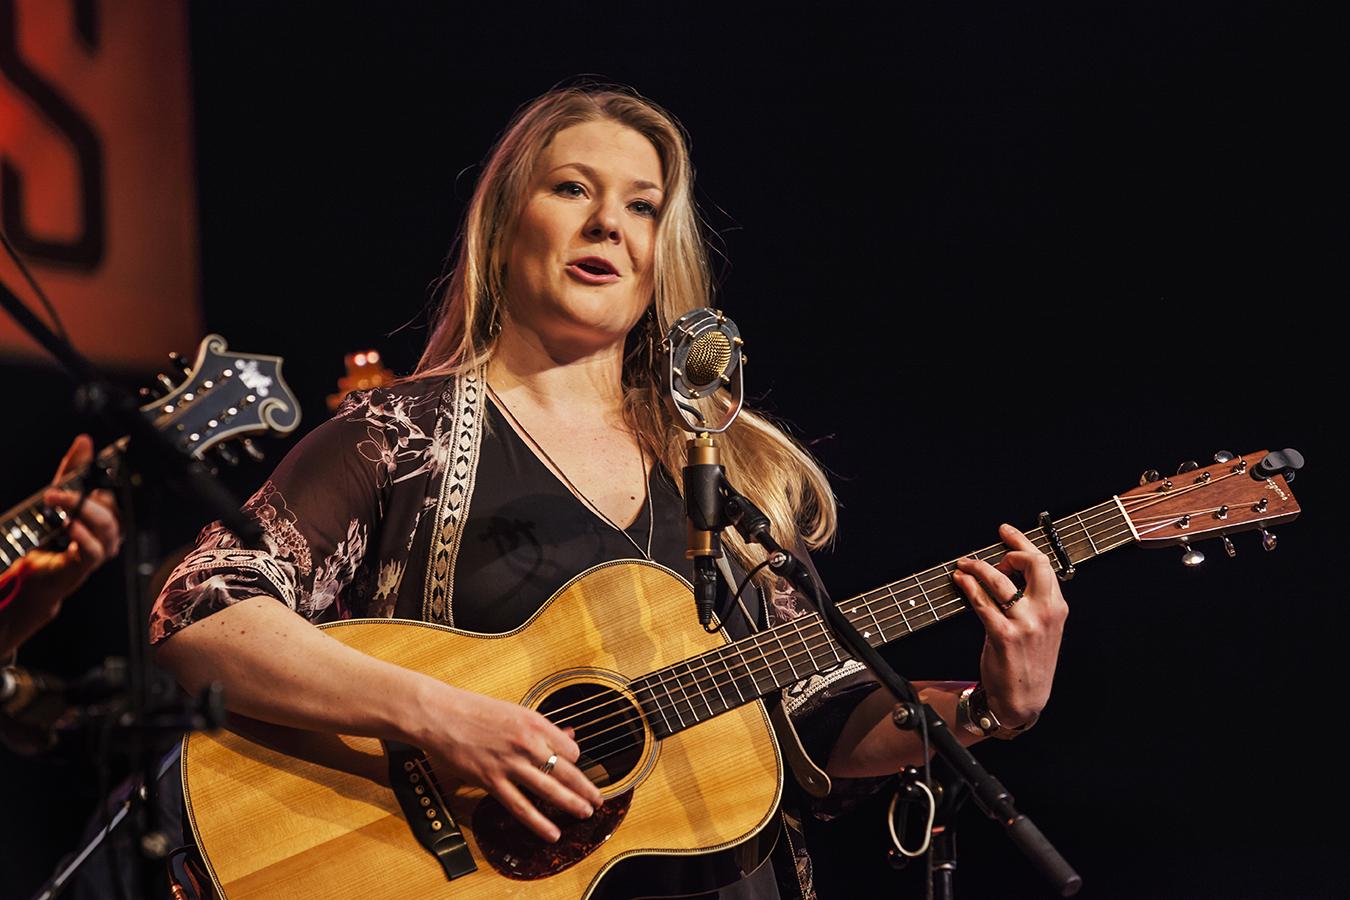 celia woodsmith, lead singer for della mae. photo by hermon joyner.